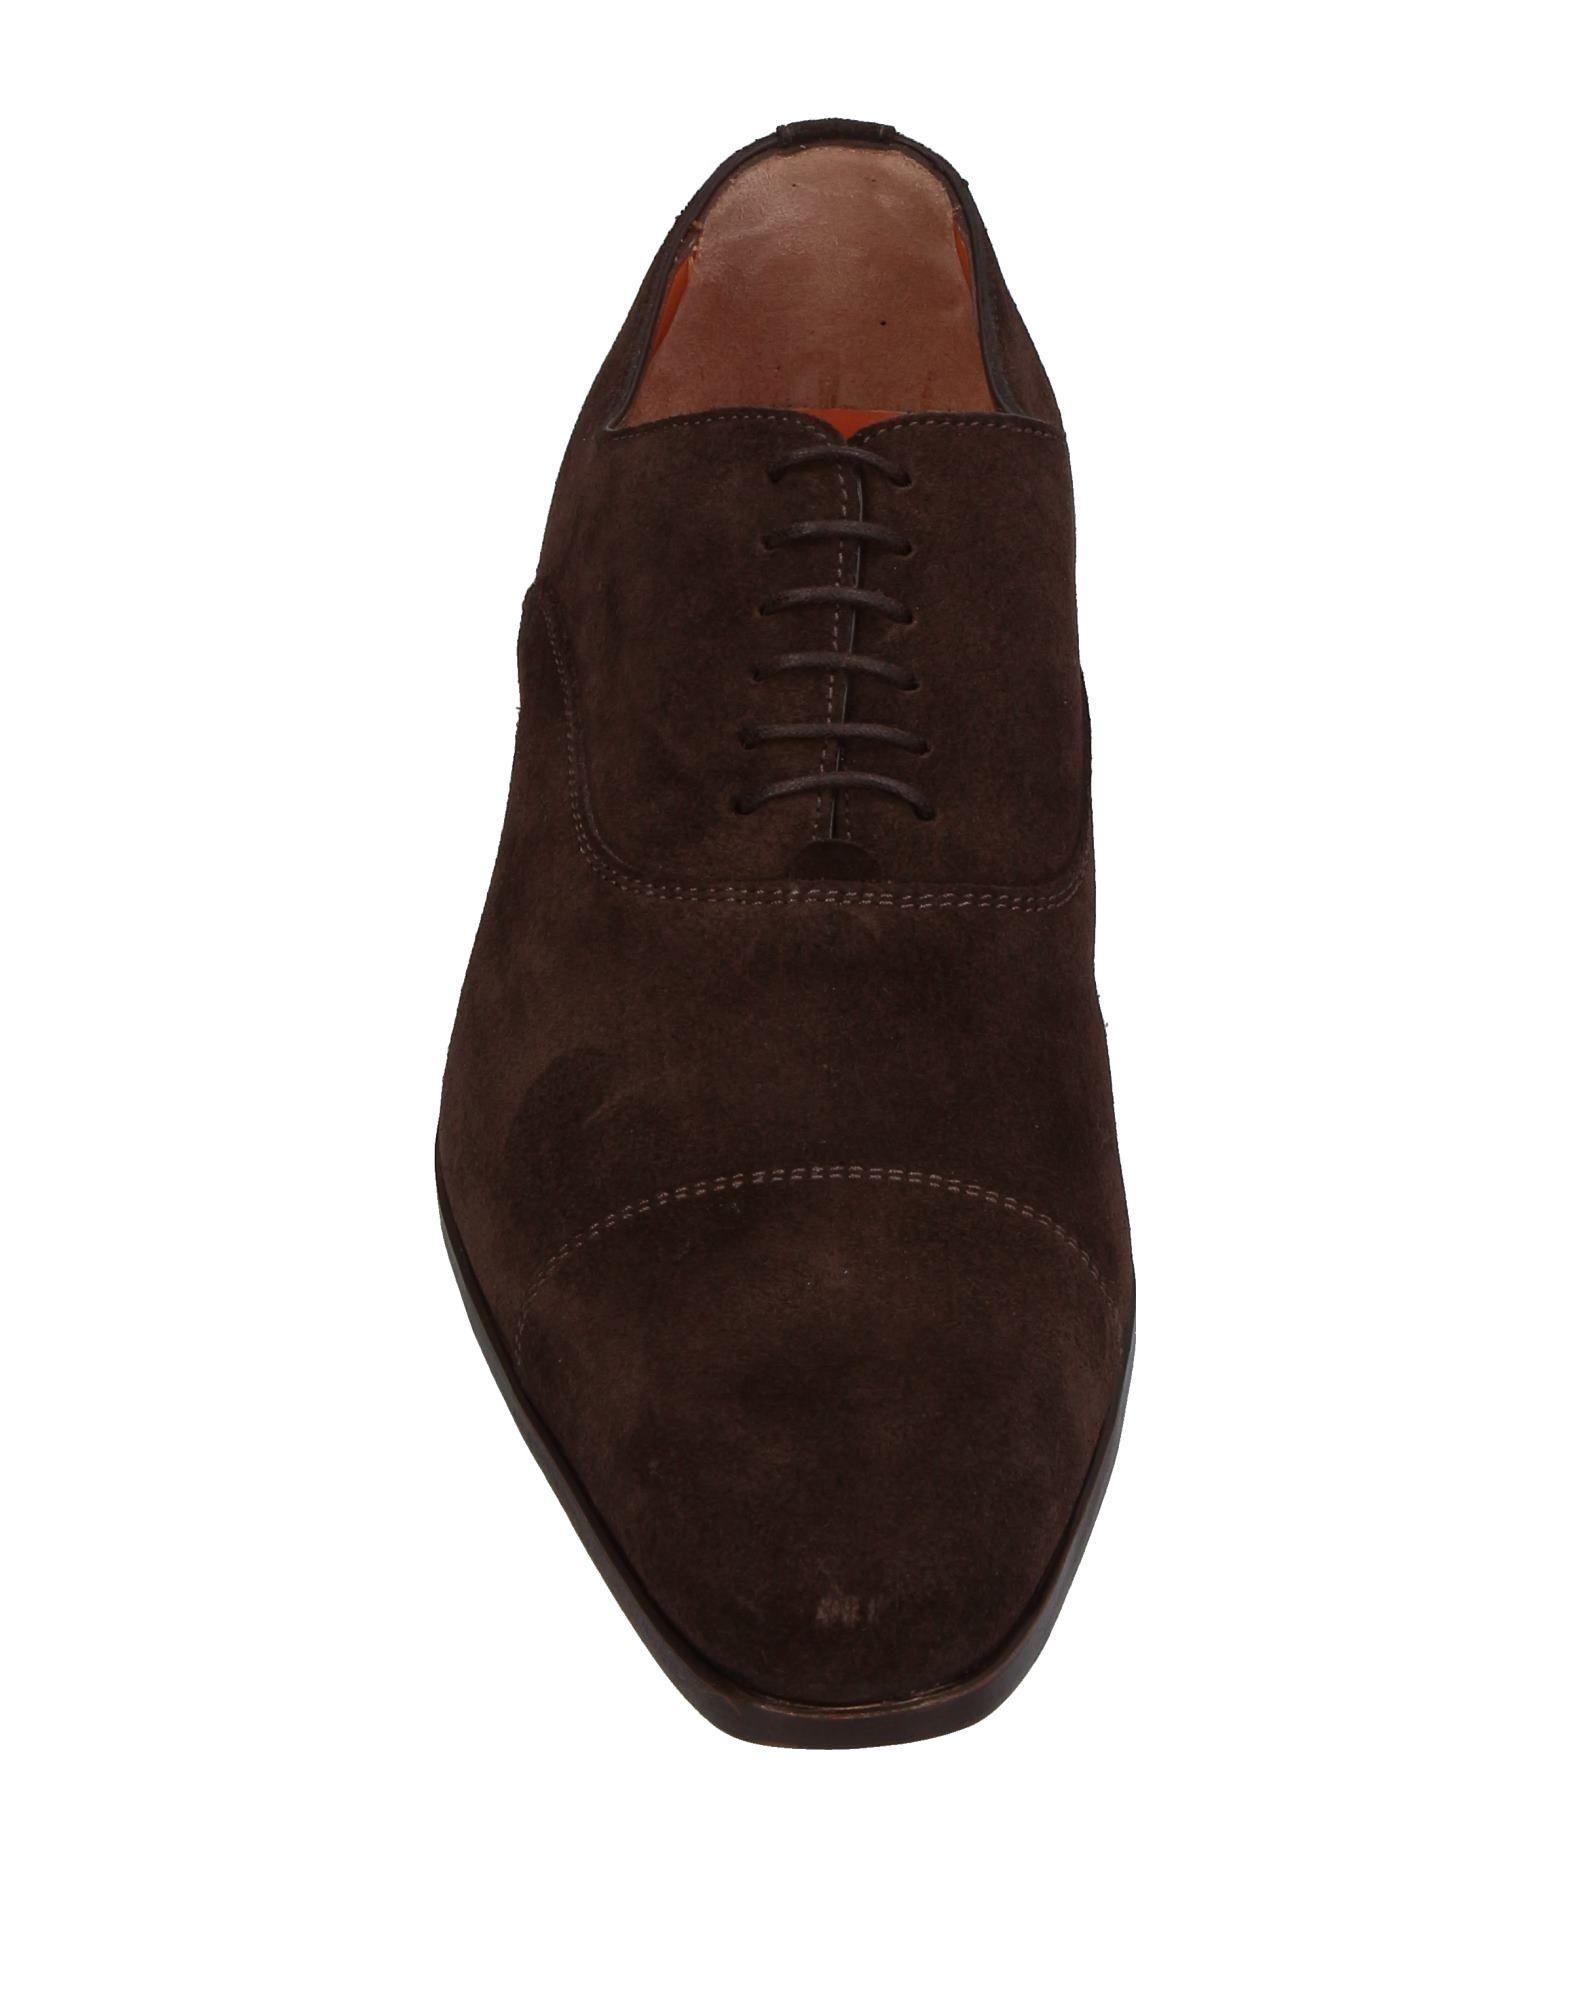 Santoni Schnürschuhe Gute Herren  11409466DB Gute Schnürschuhe Qualität beliebte Schuhe a6c4aa